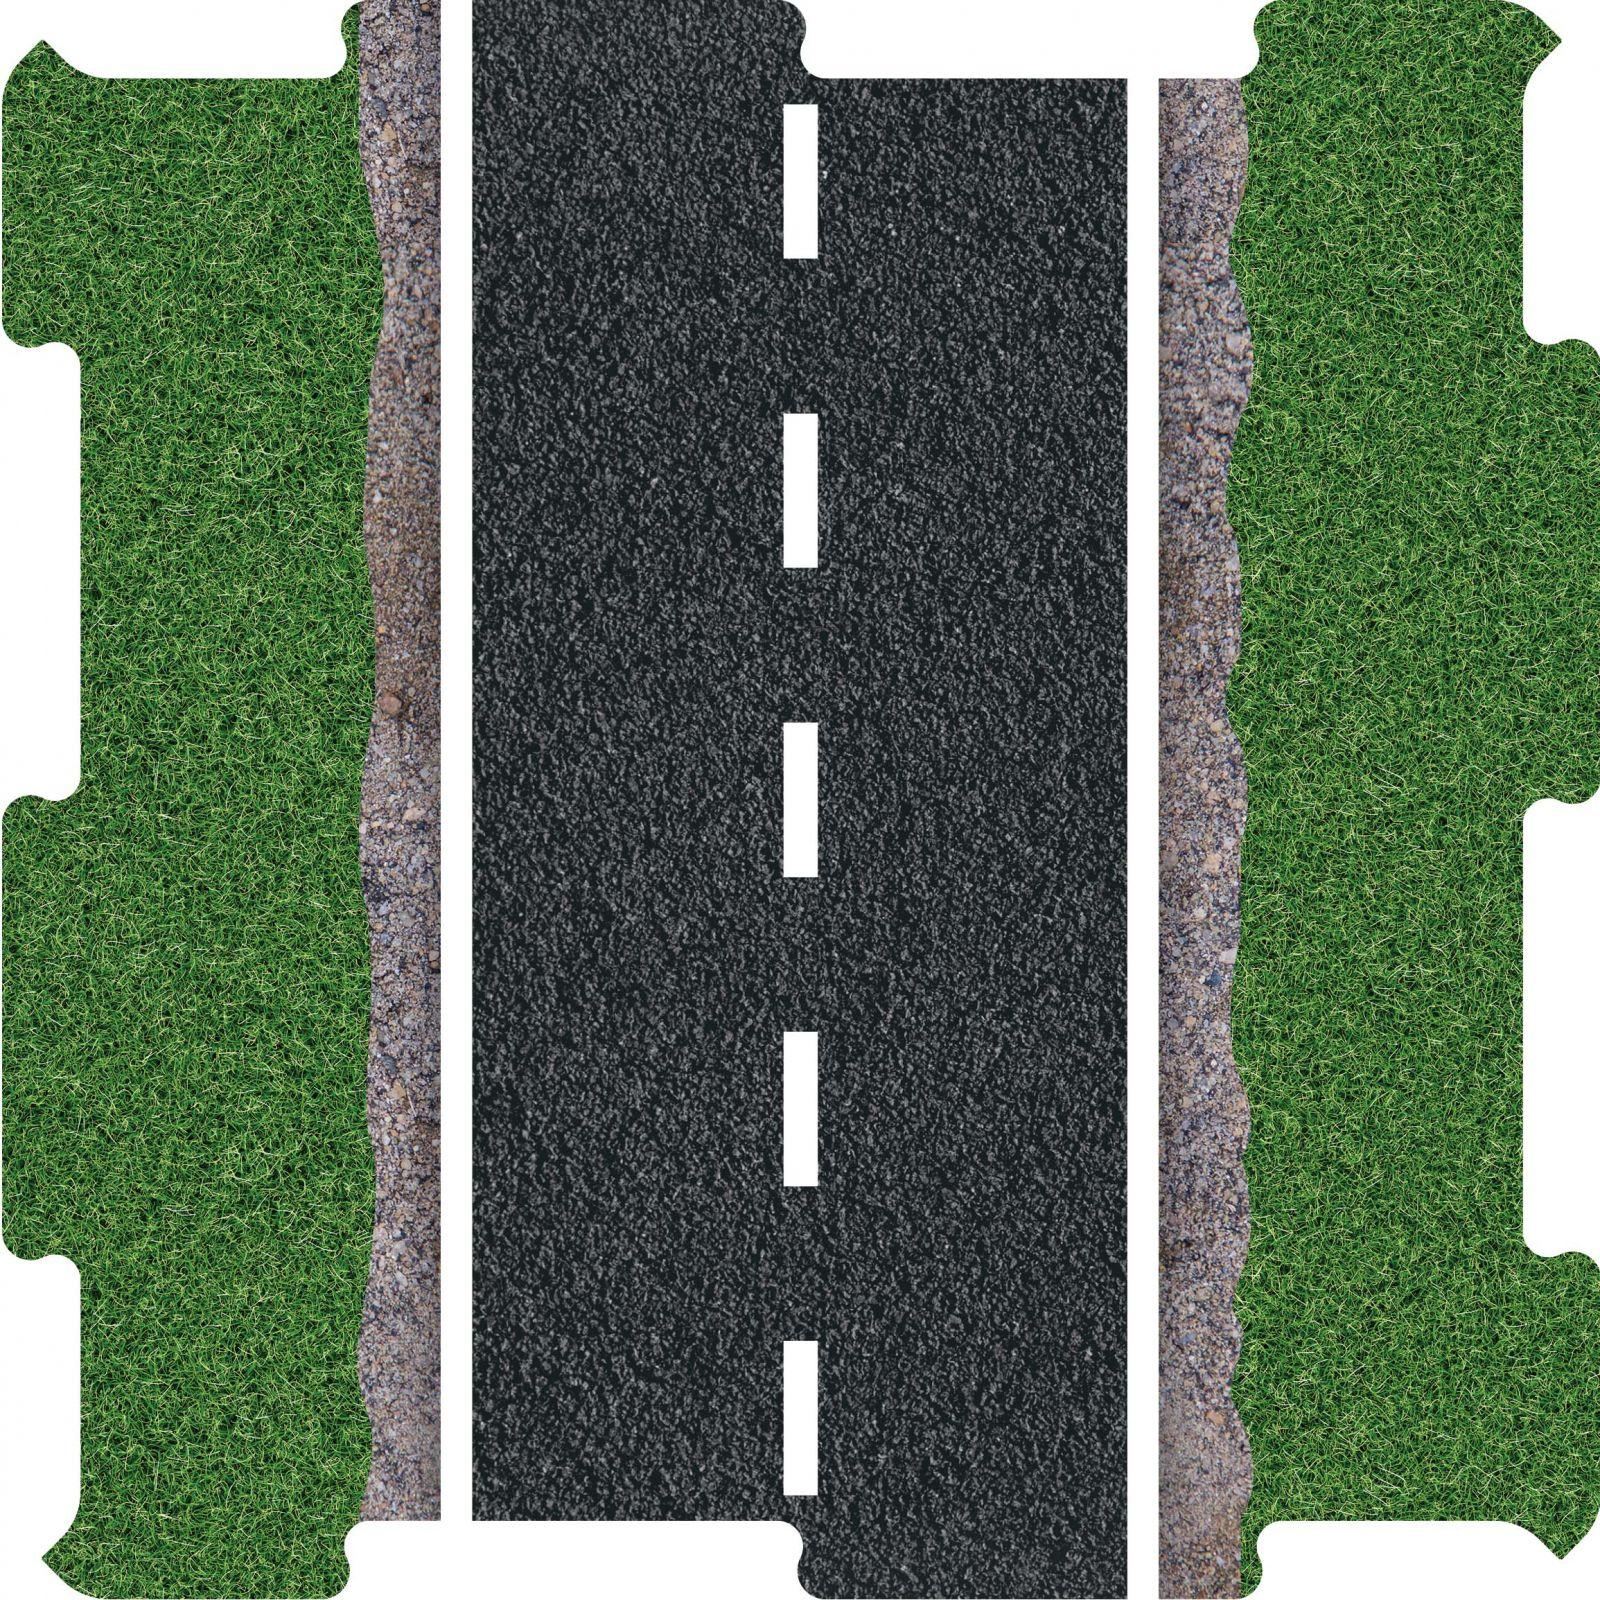 Podlahove puzzle silnice